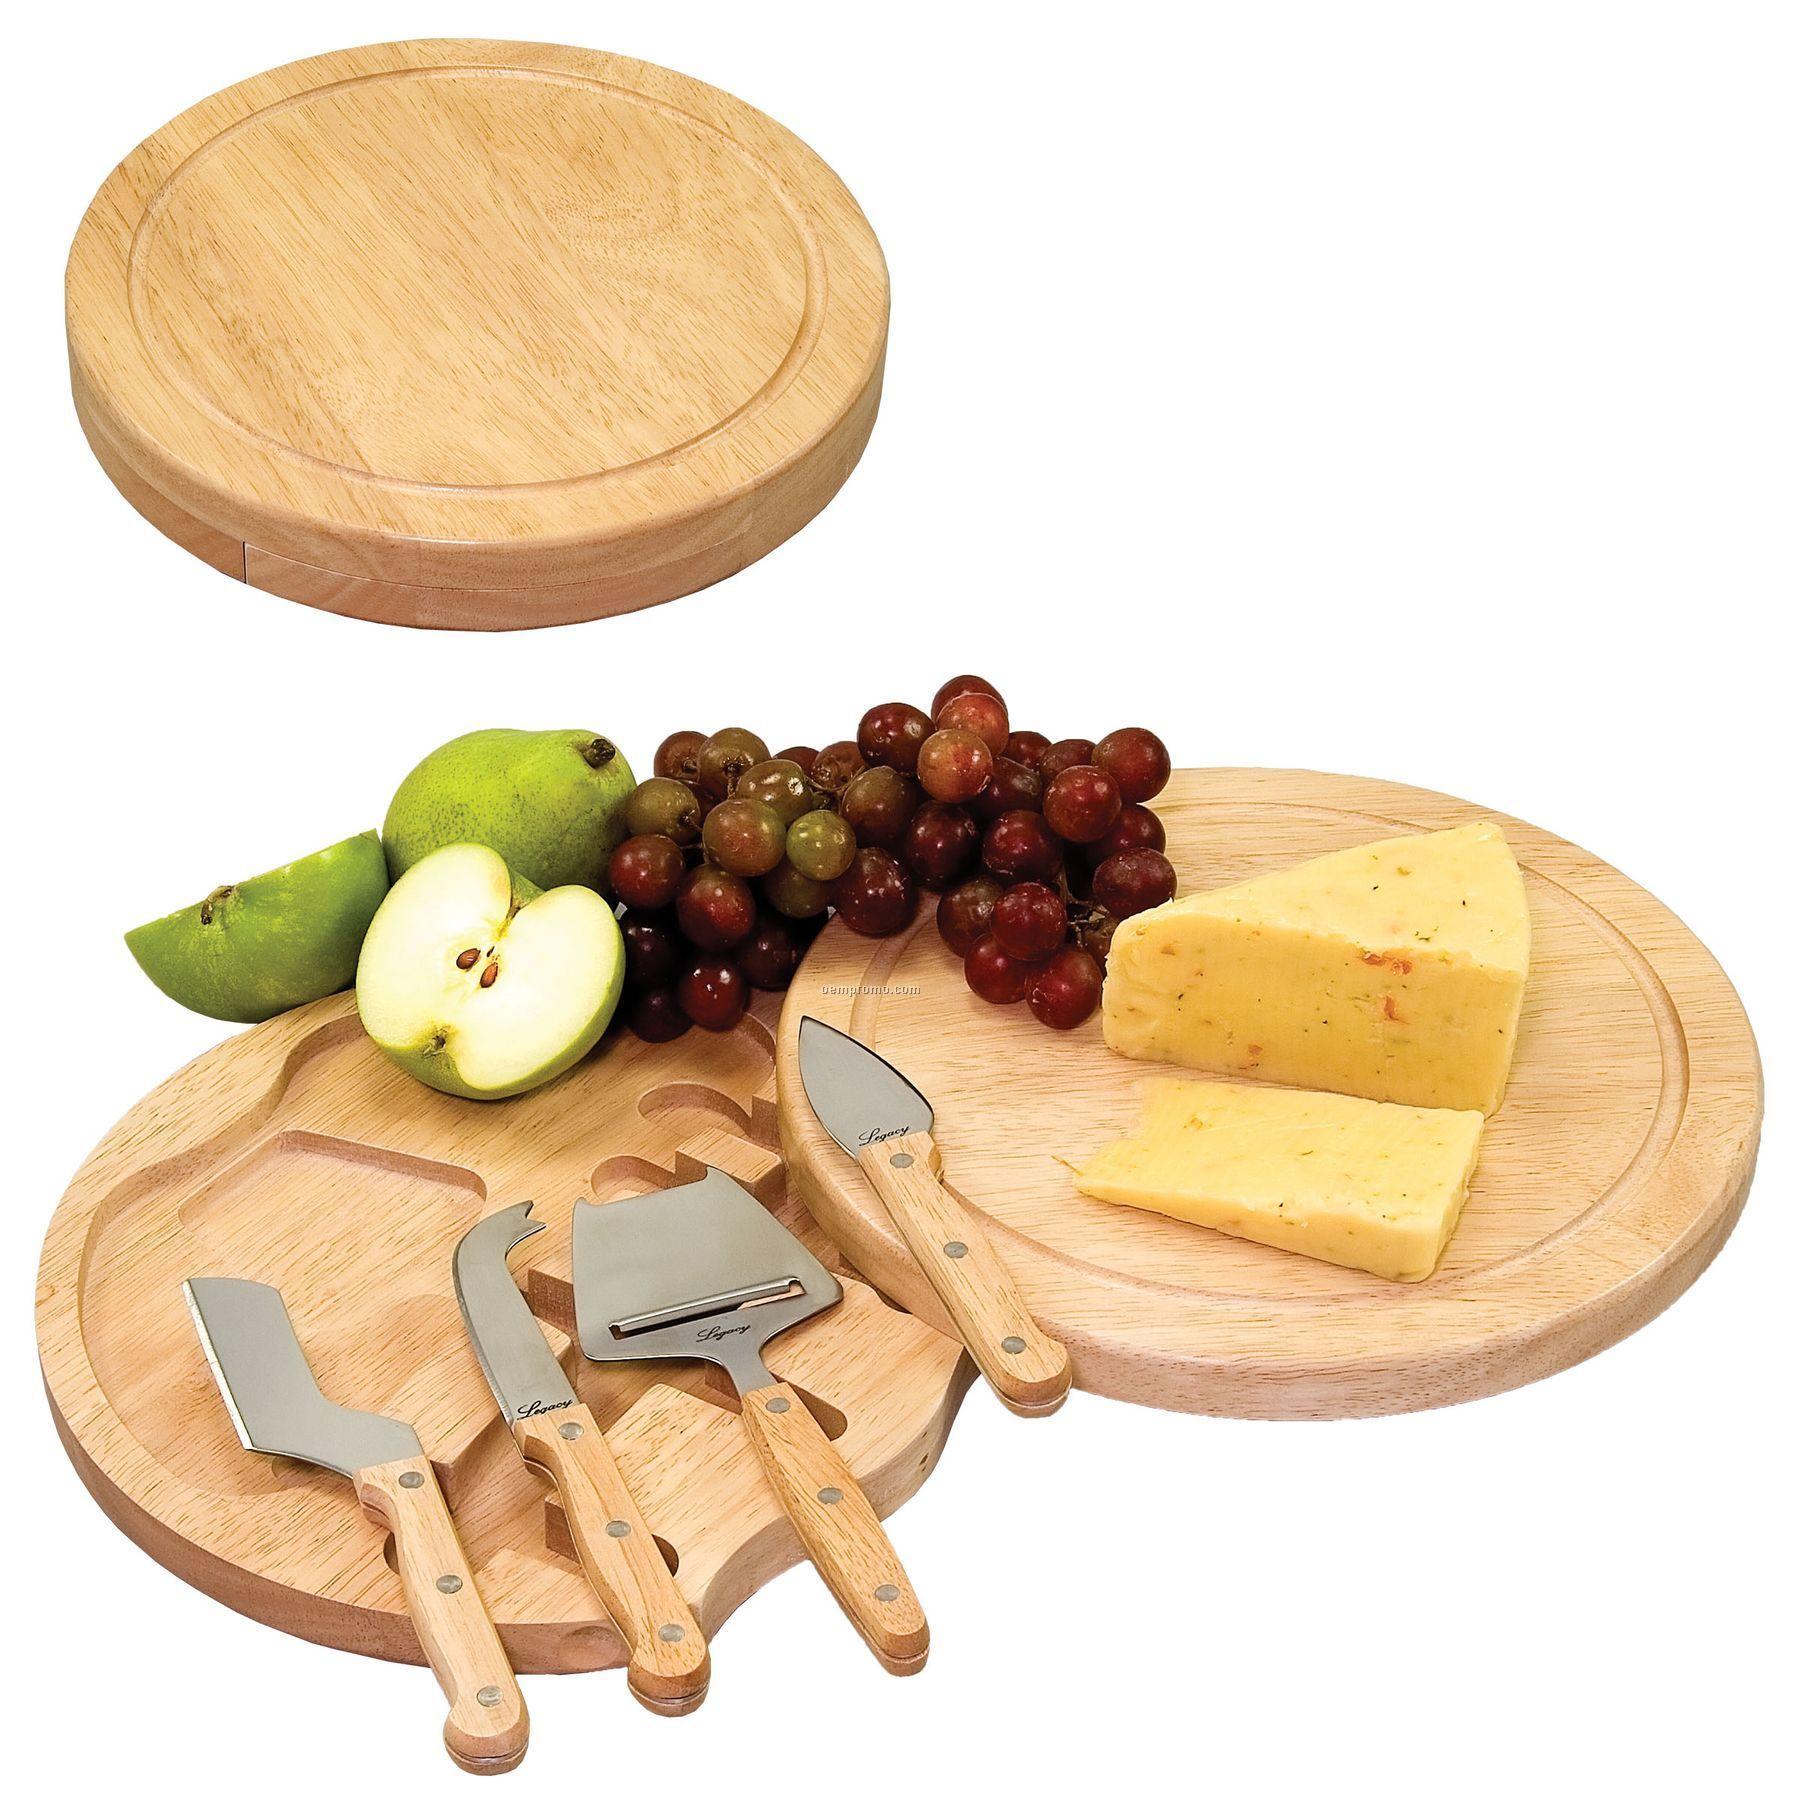 "Circo 10.2"" Circular Cutting Board W/ 4 Stainless Steel Cheese Tools"